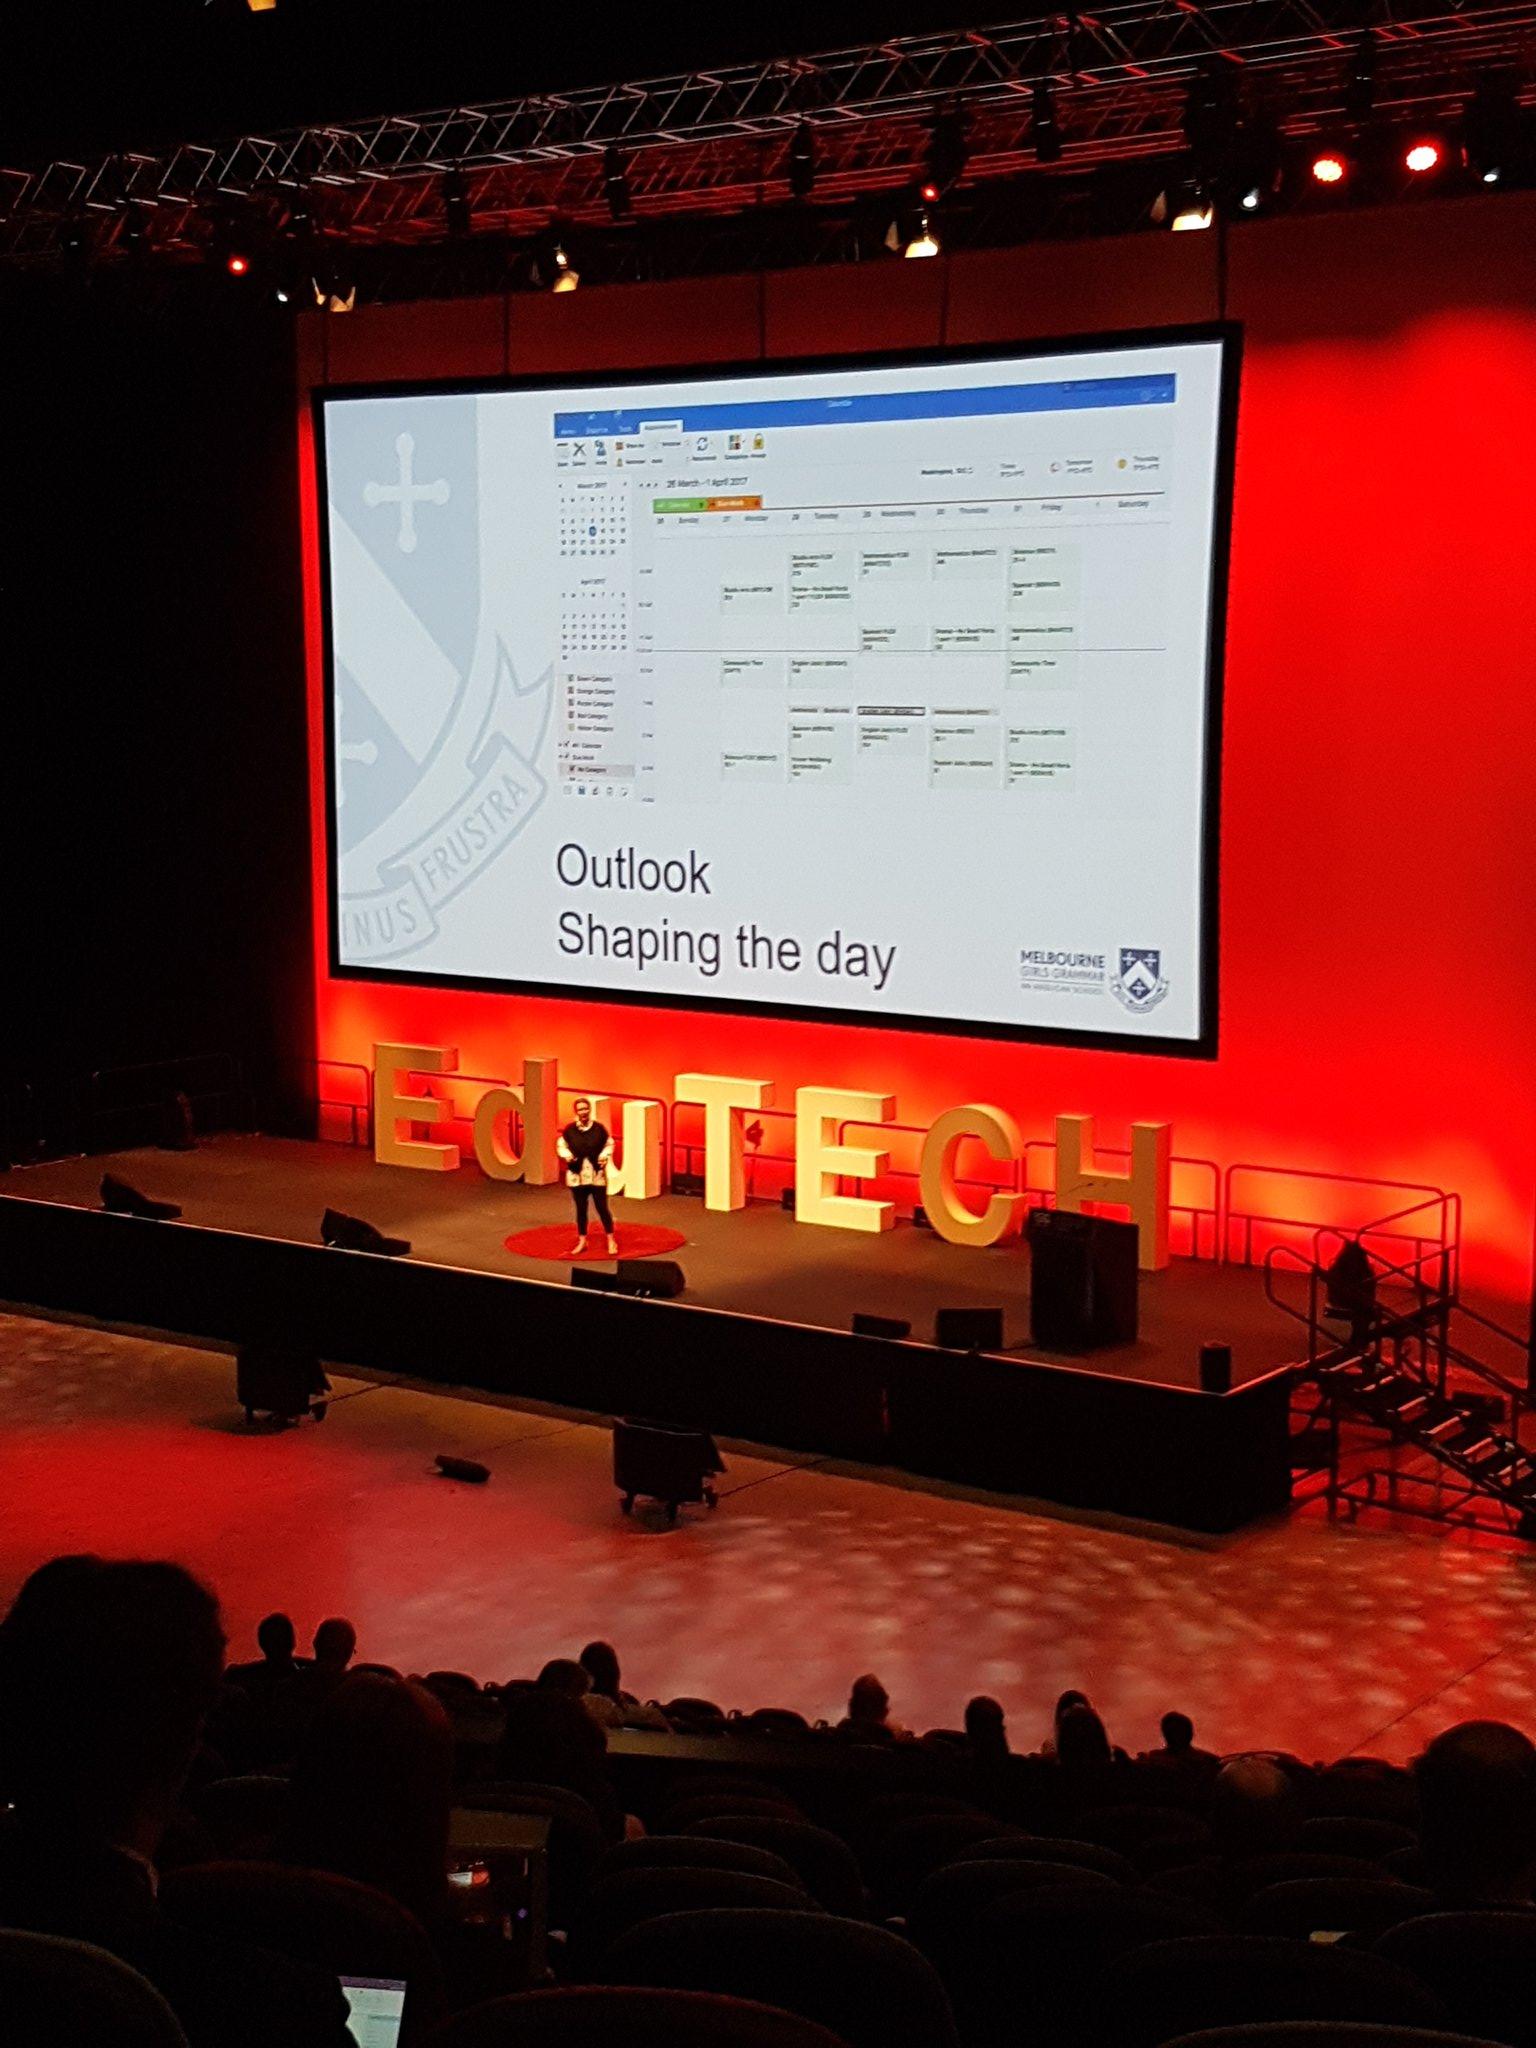 First tech, slot in fixed course commitments #edutechau https://t.co/uXqRvA22cV